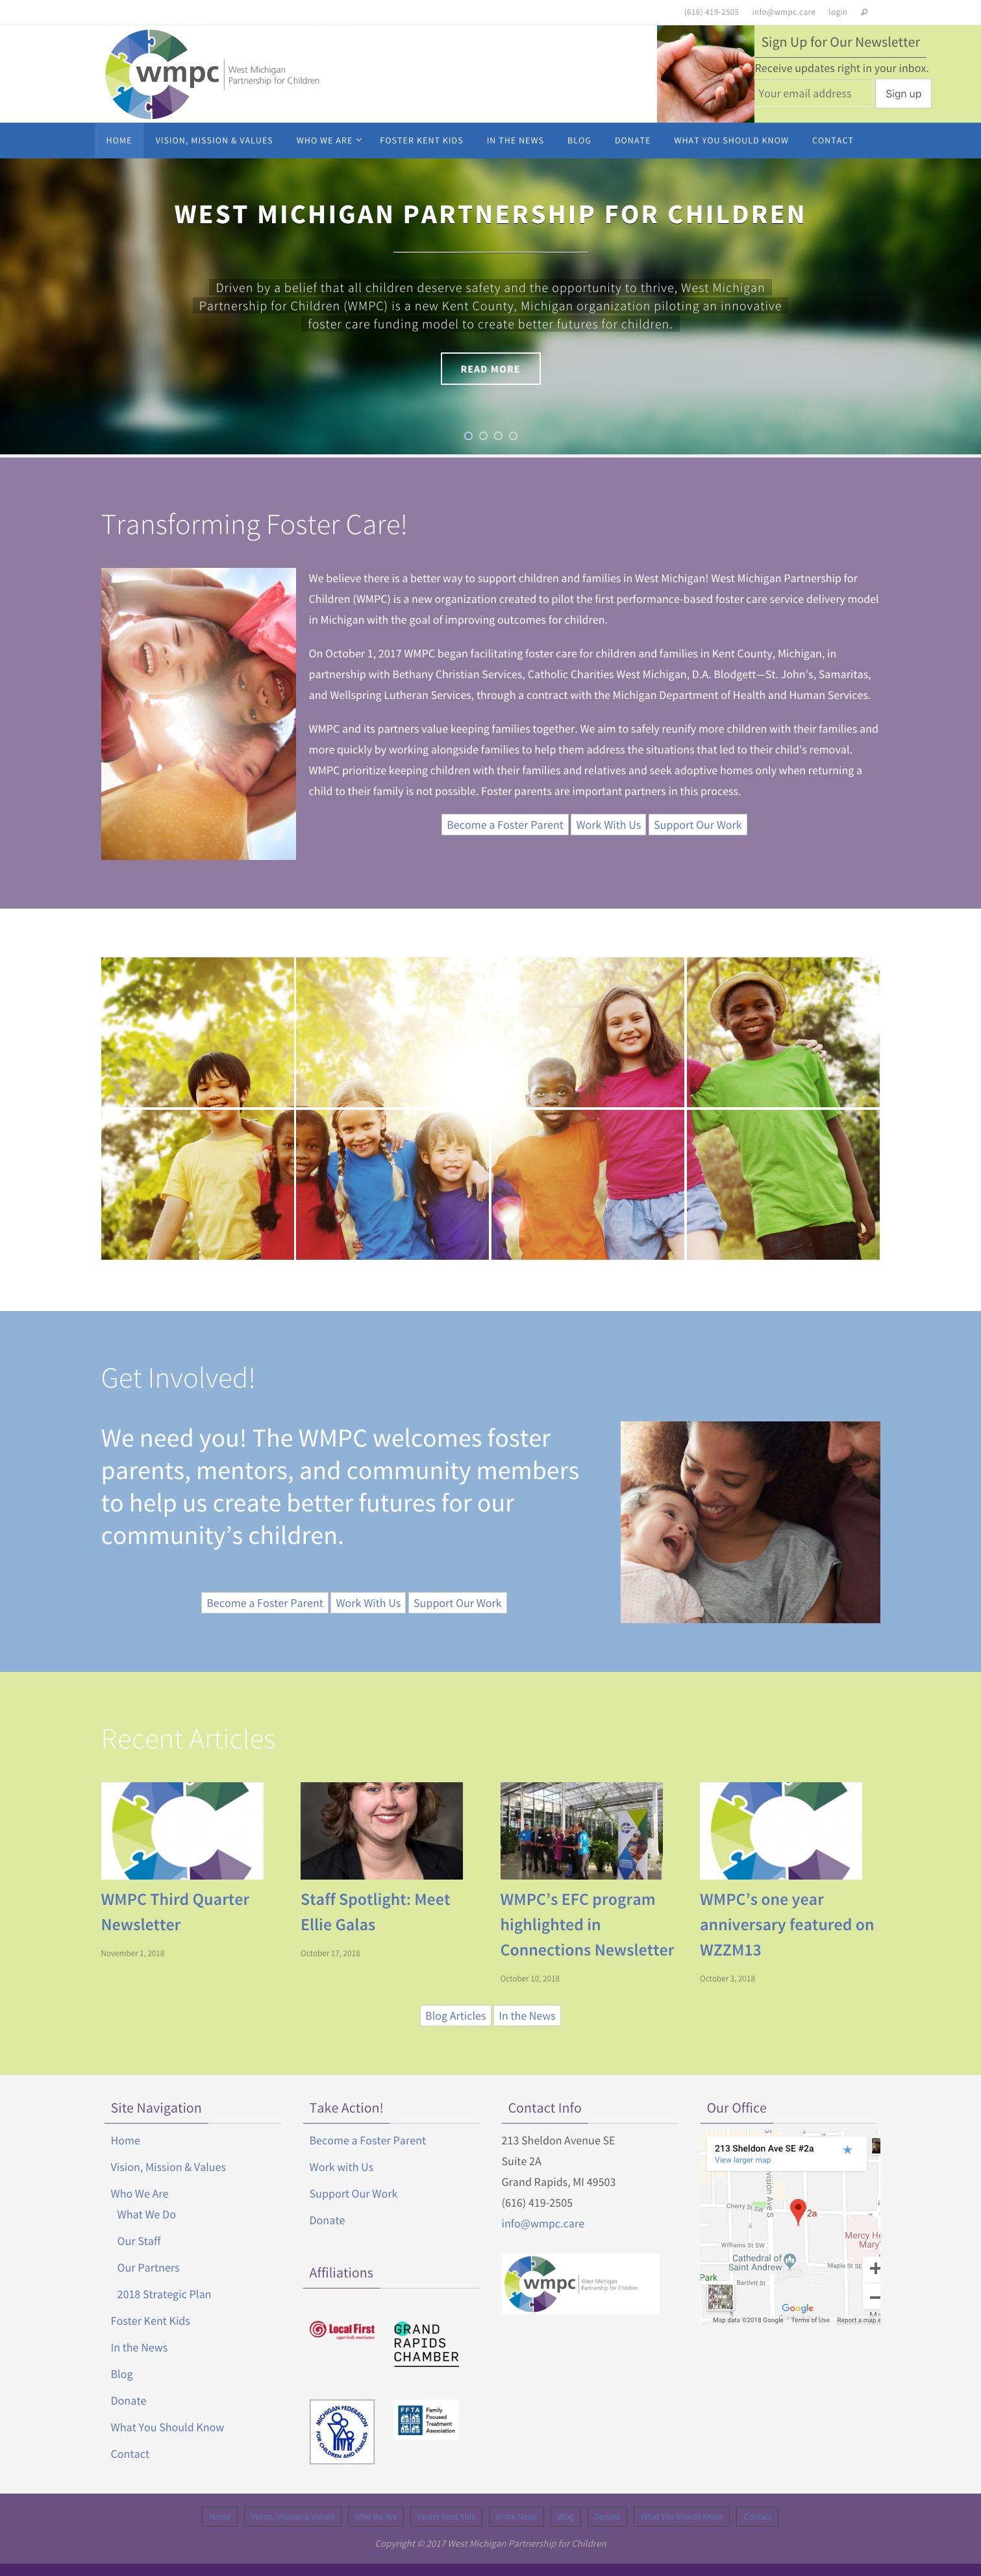 West Michigan Partnership for Children